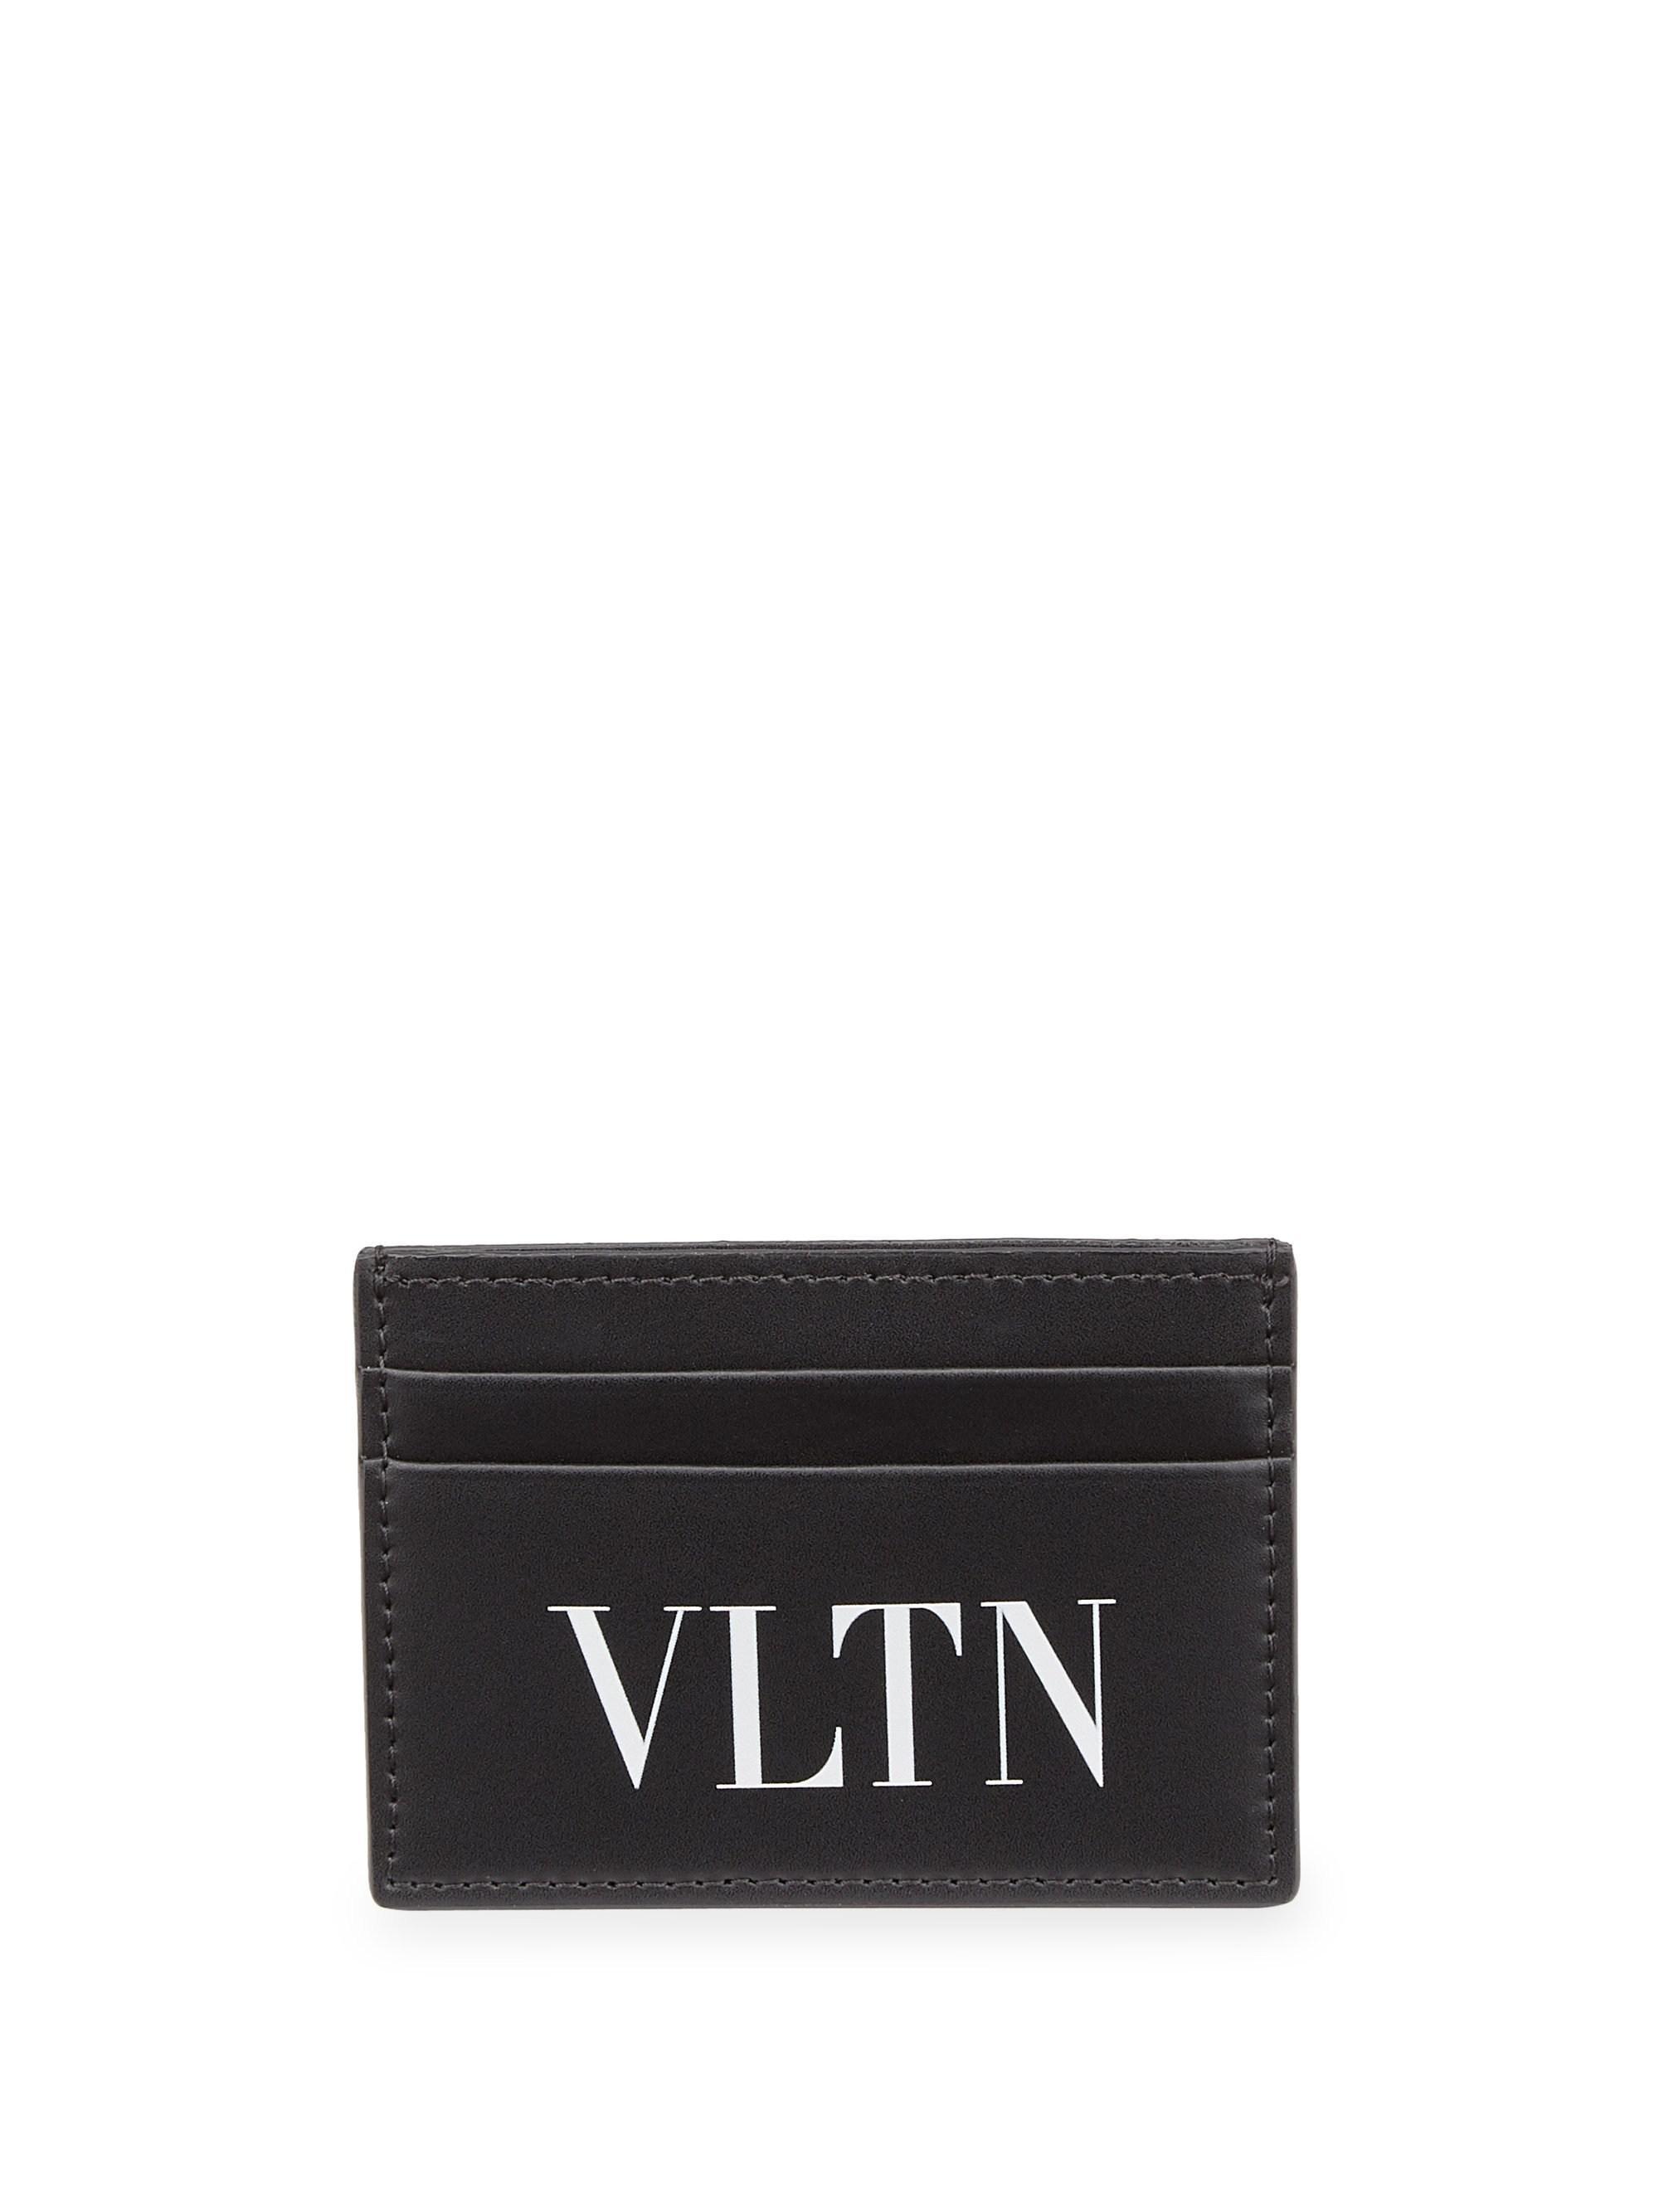 valentino mens black small logo leather credit card holder - Small Credit Card Holder